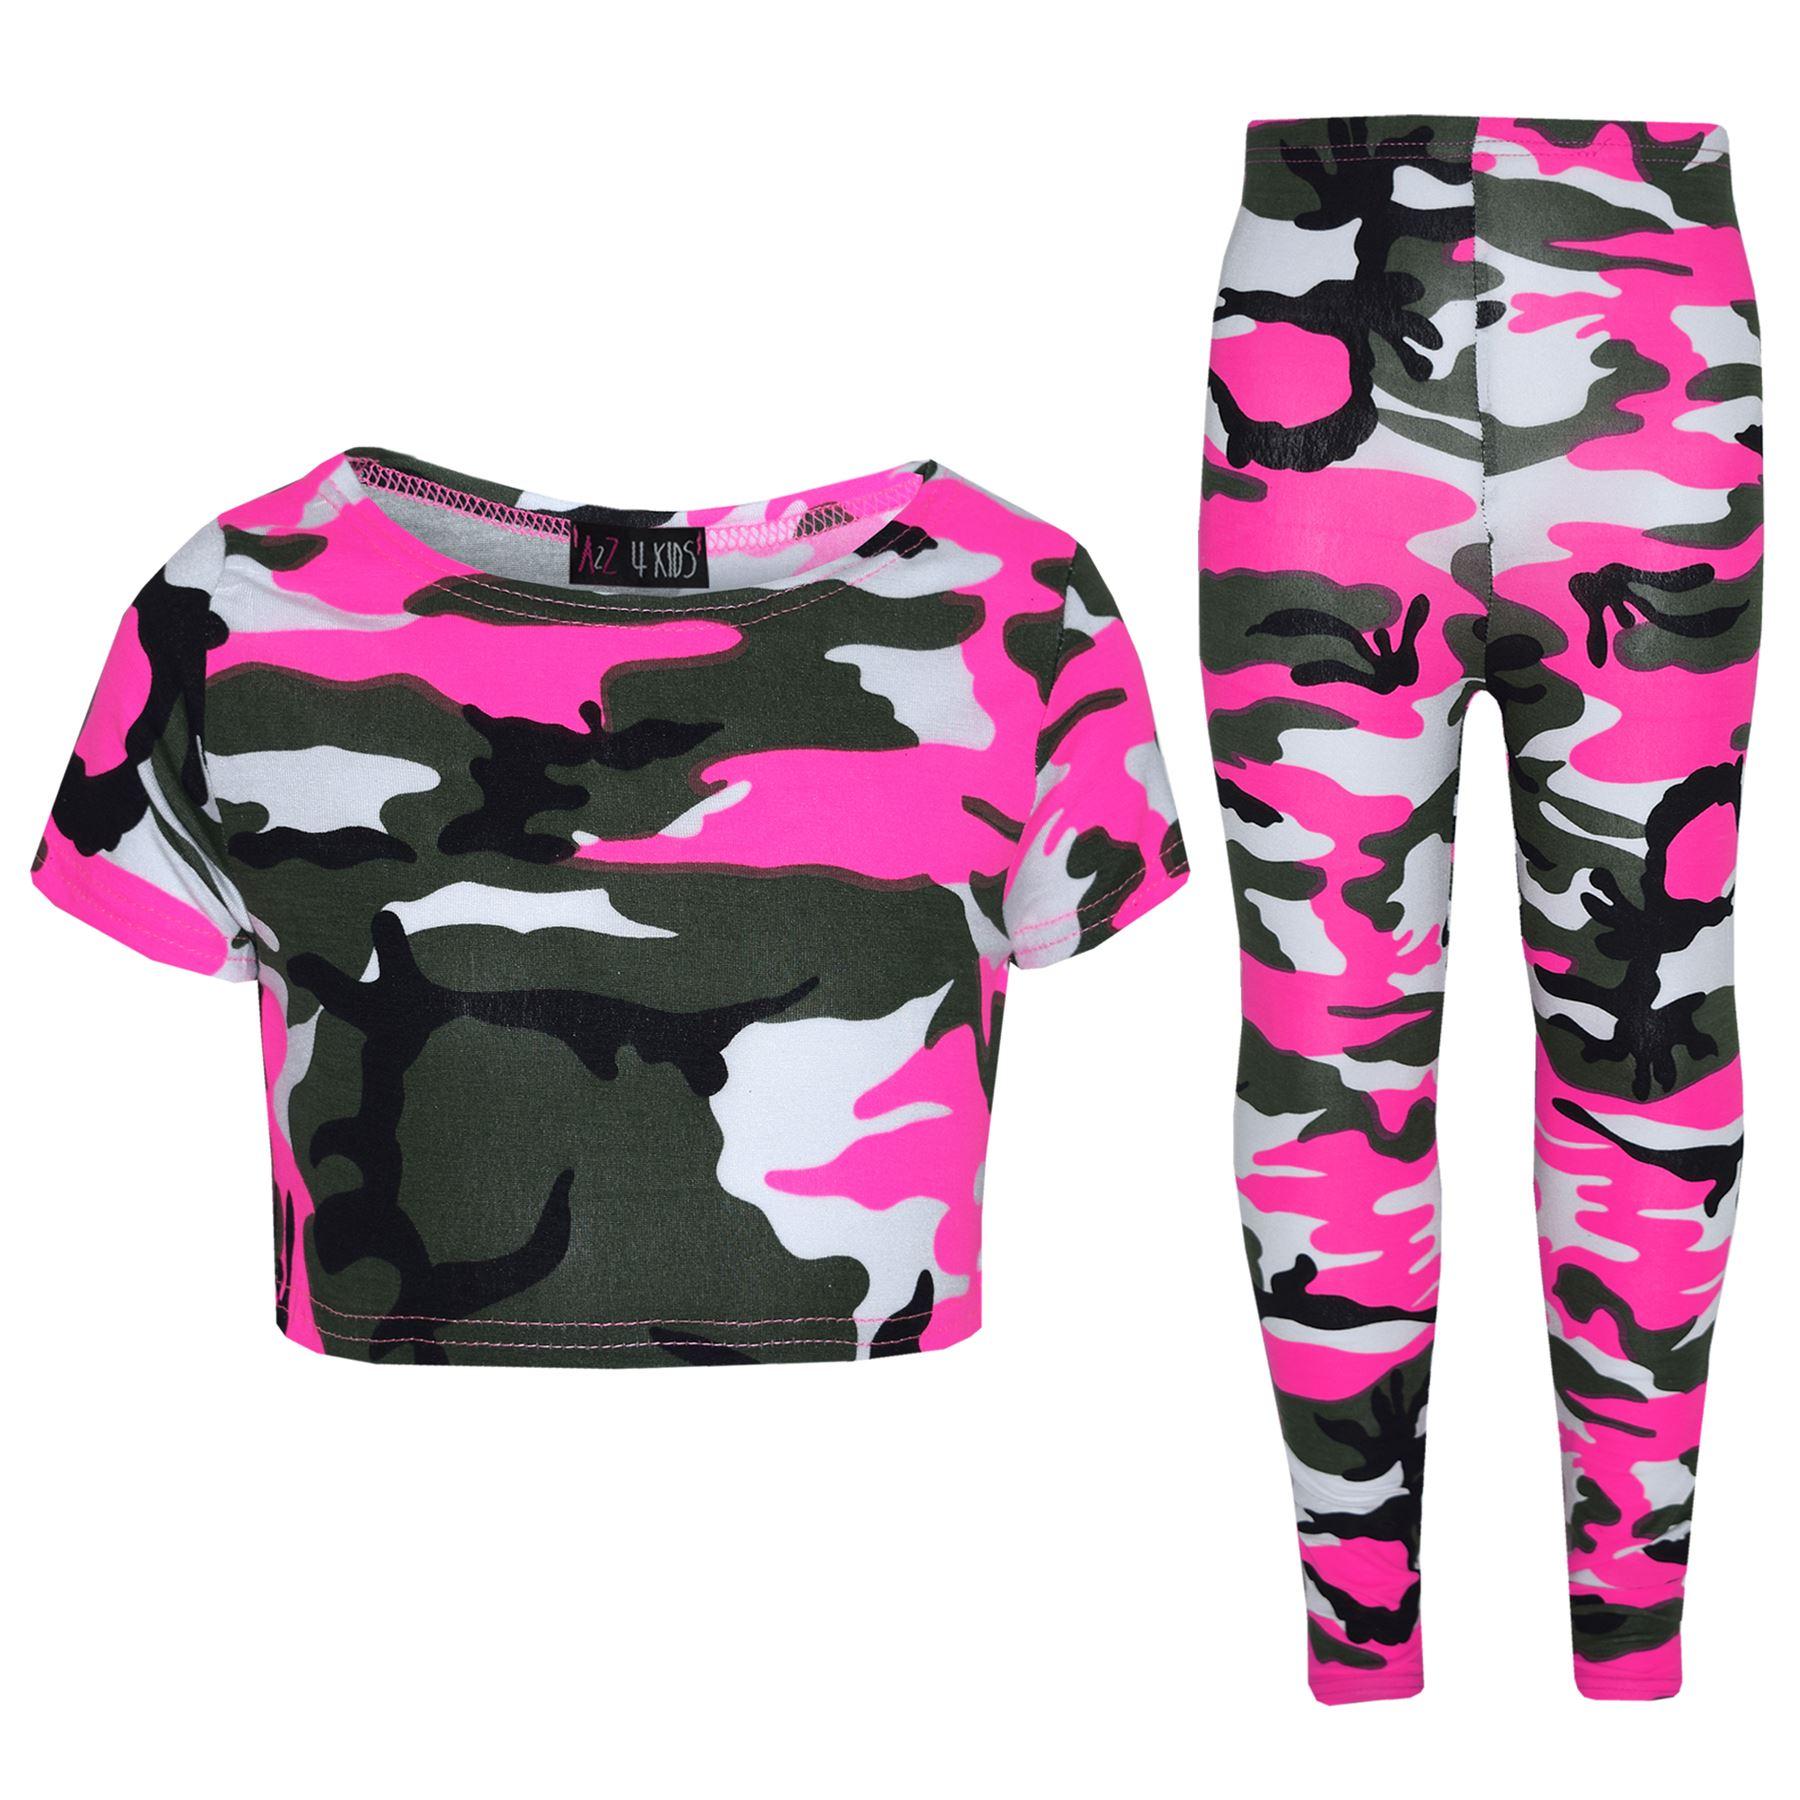 A2Z 4 Kids Girls Tops Kids Designers Camouflage Print Trendy Crop Top Legging Set 7-13 Yr